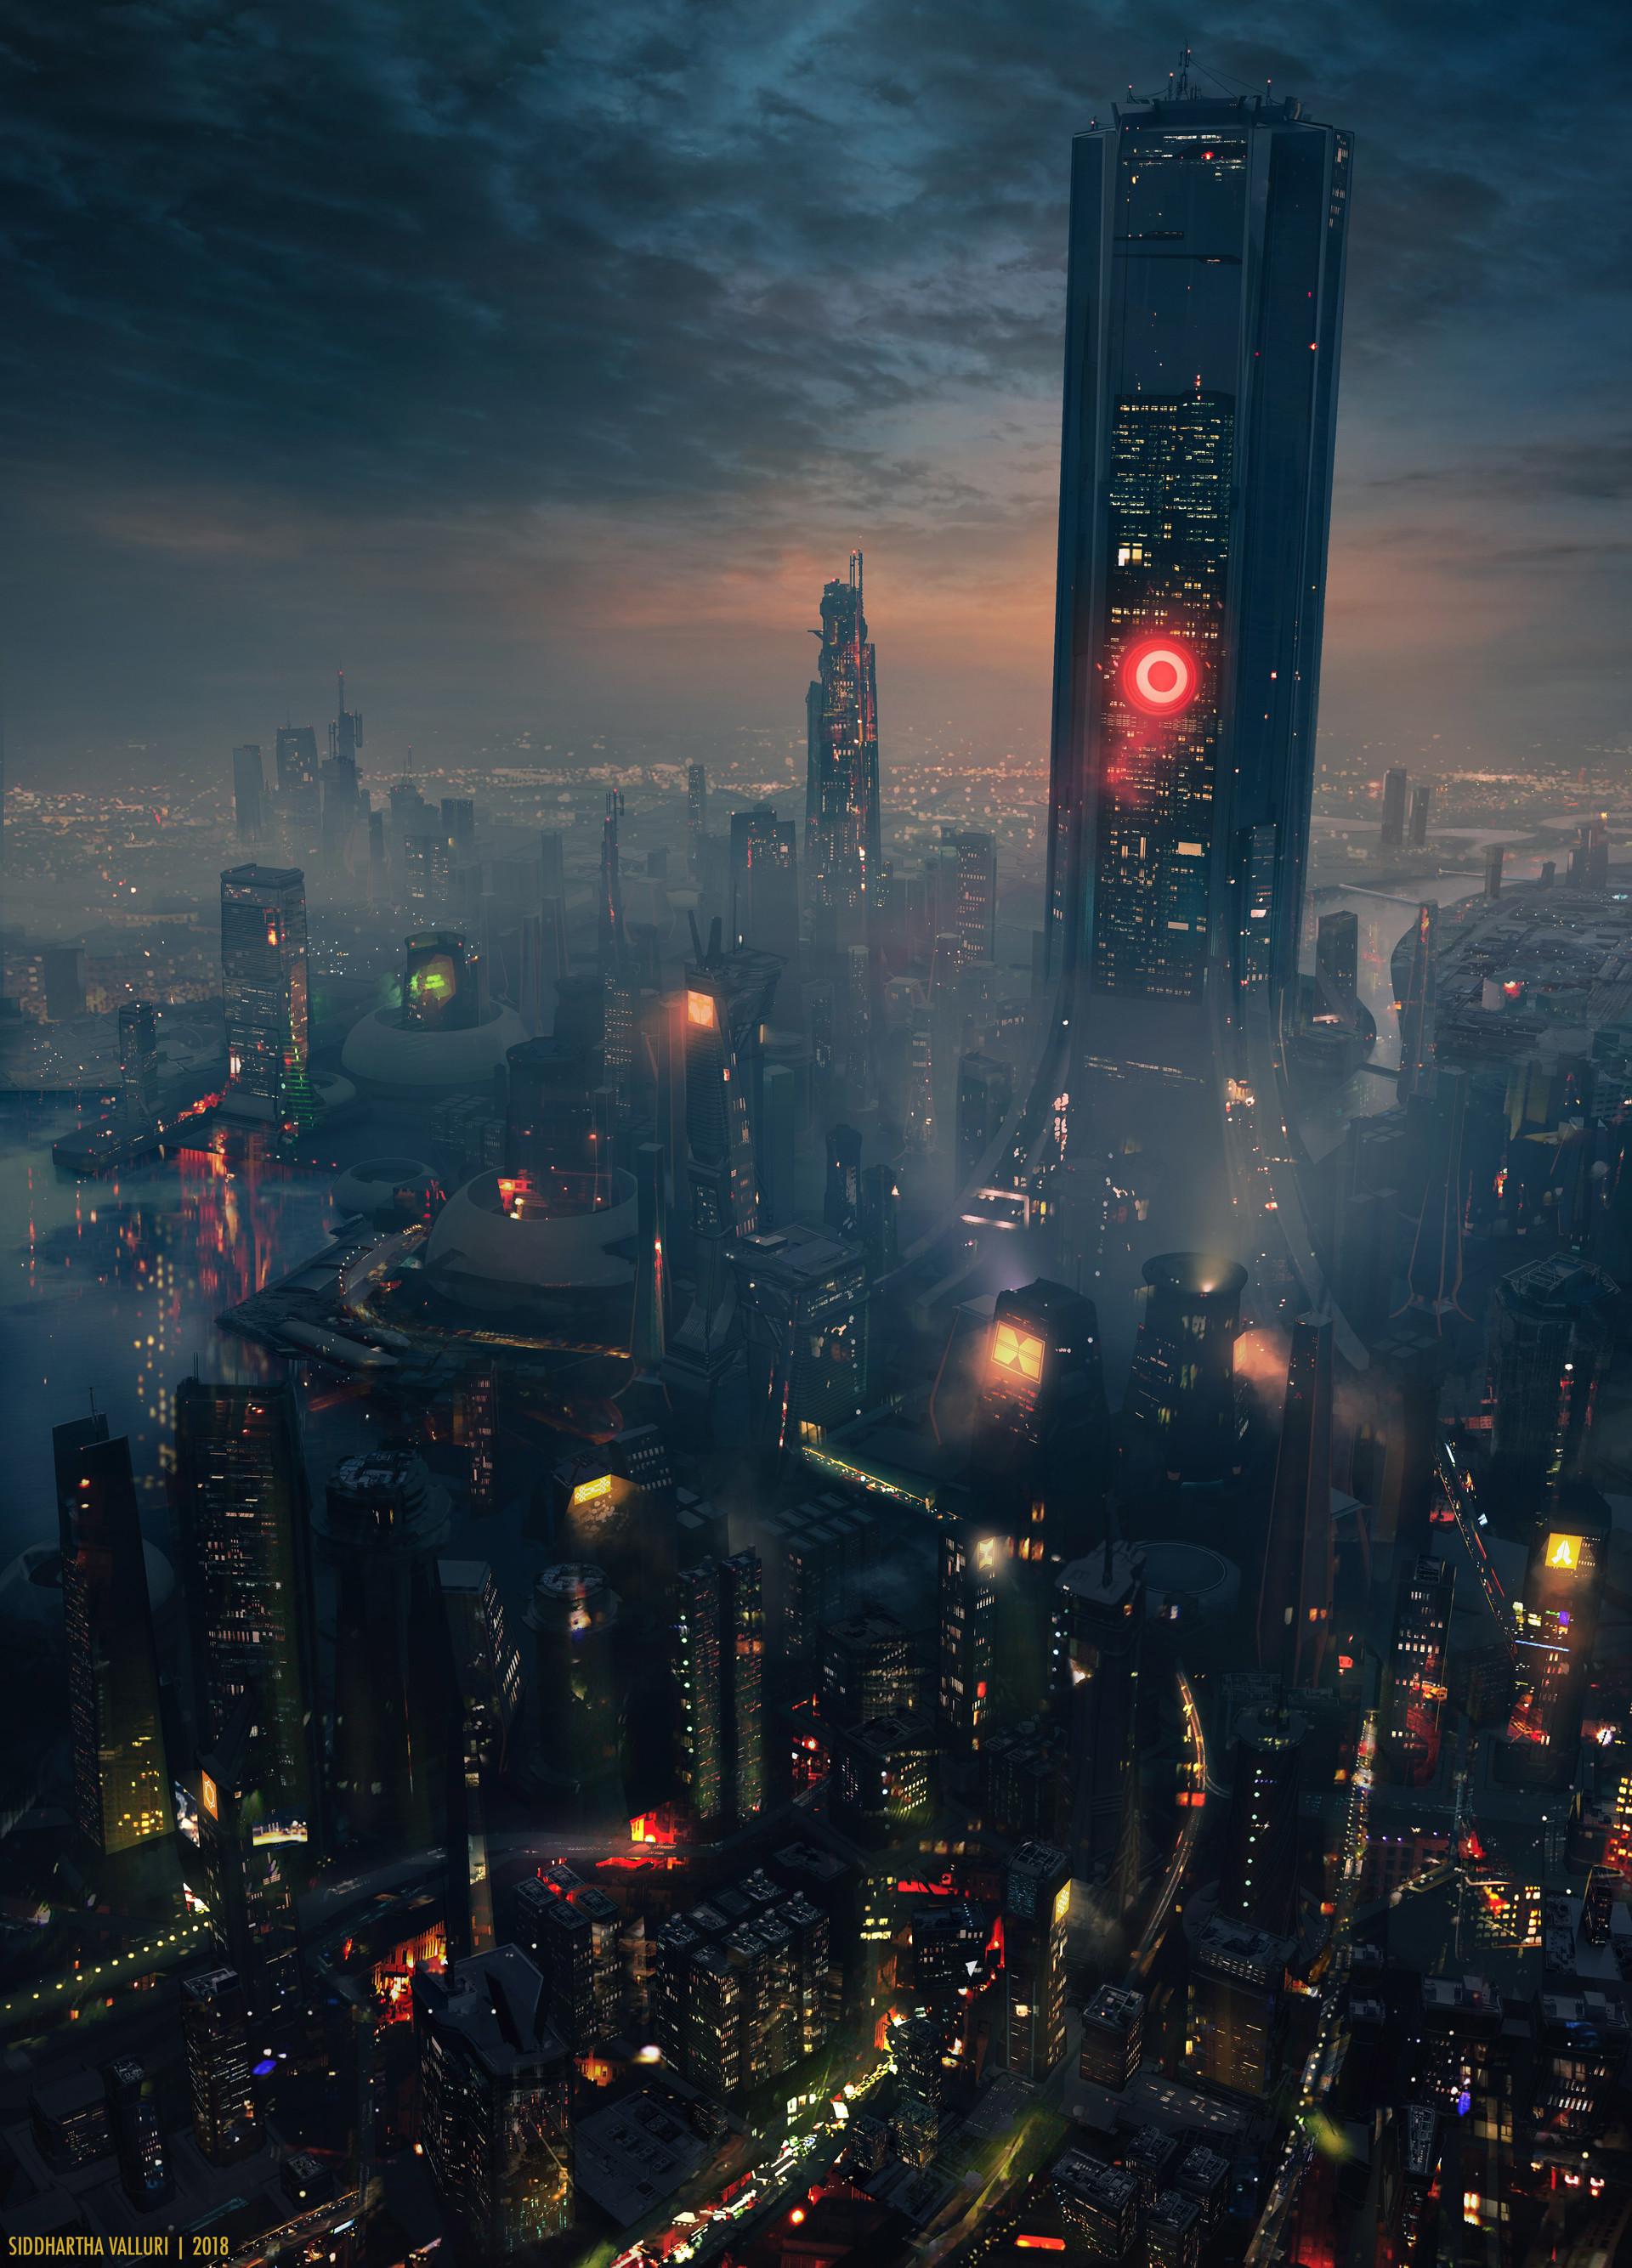 General 1920x2669 concept art cyberpunk city night dark science fiction cityscape smoke futuristic architecture building artwork digital portrait display